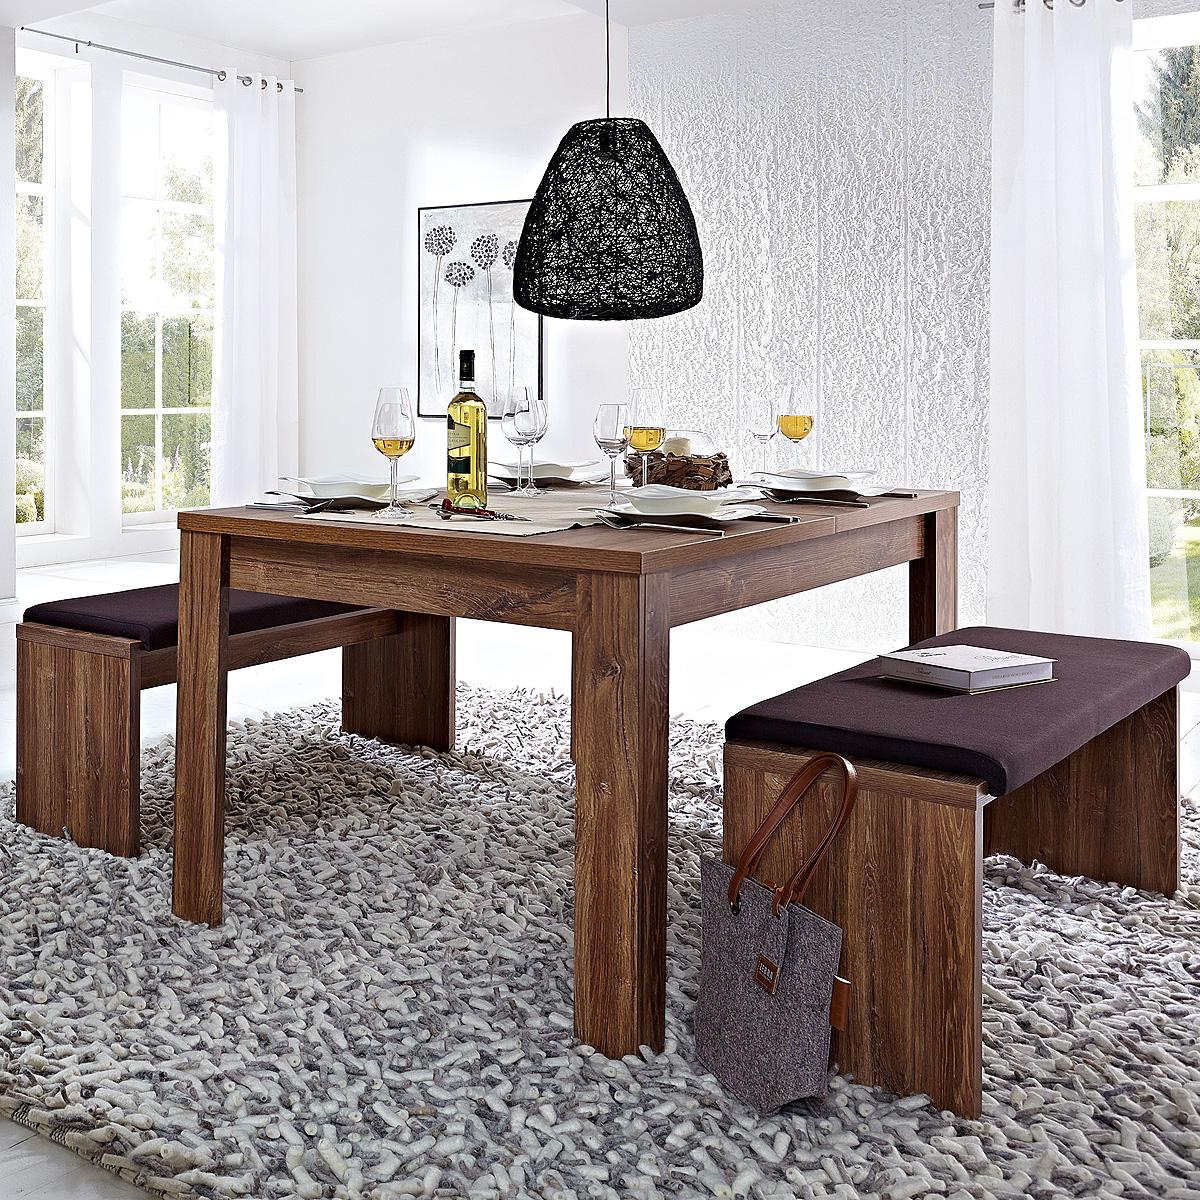 tischgruppe br ssel esszimmerset tisch bank inkl polster in akazie dunkel ebay. Black Bedroom Furniture Sets. Home Design Ideas